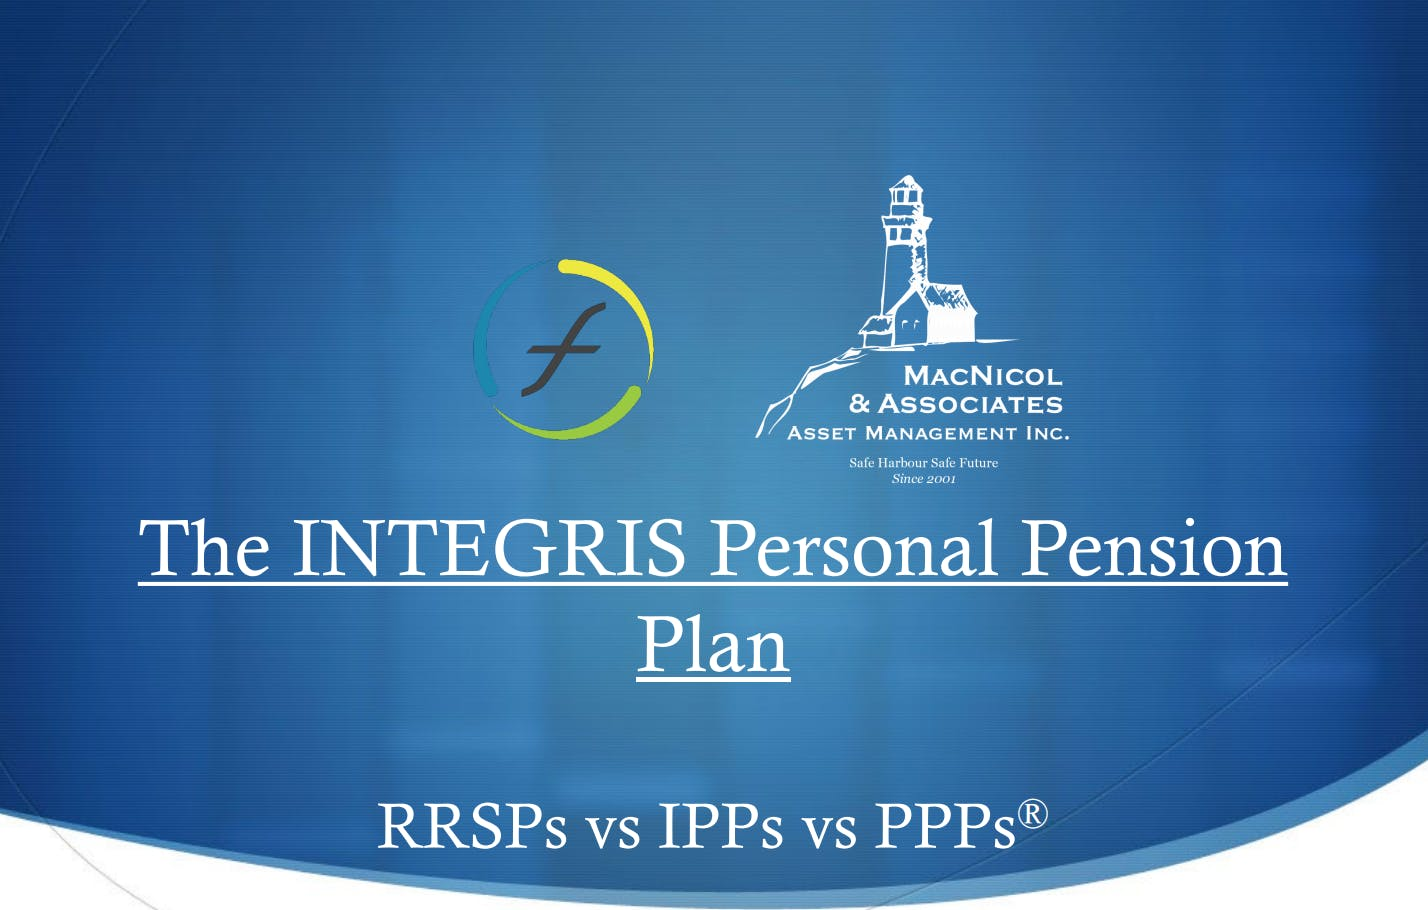 PPP® vs RRSP vs IPP + Case study for Doctors